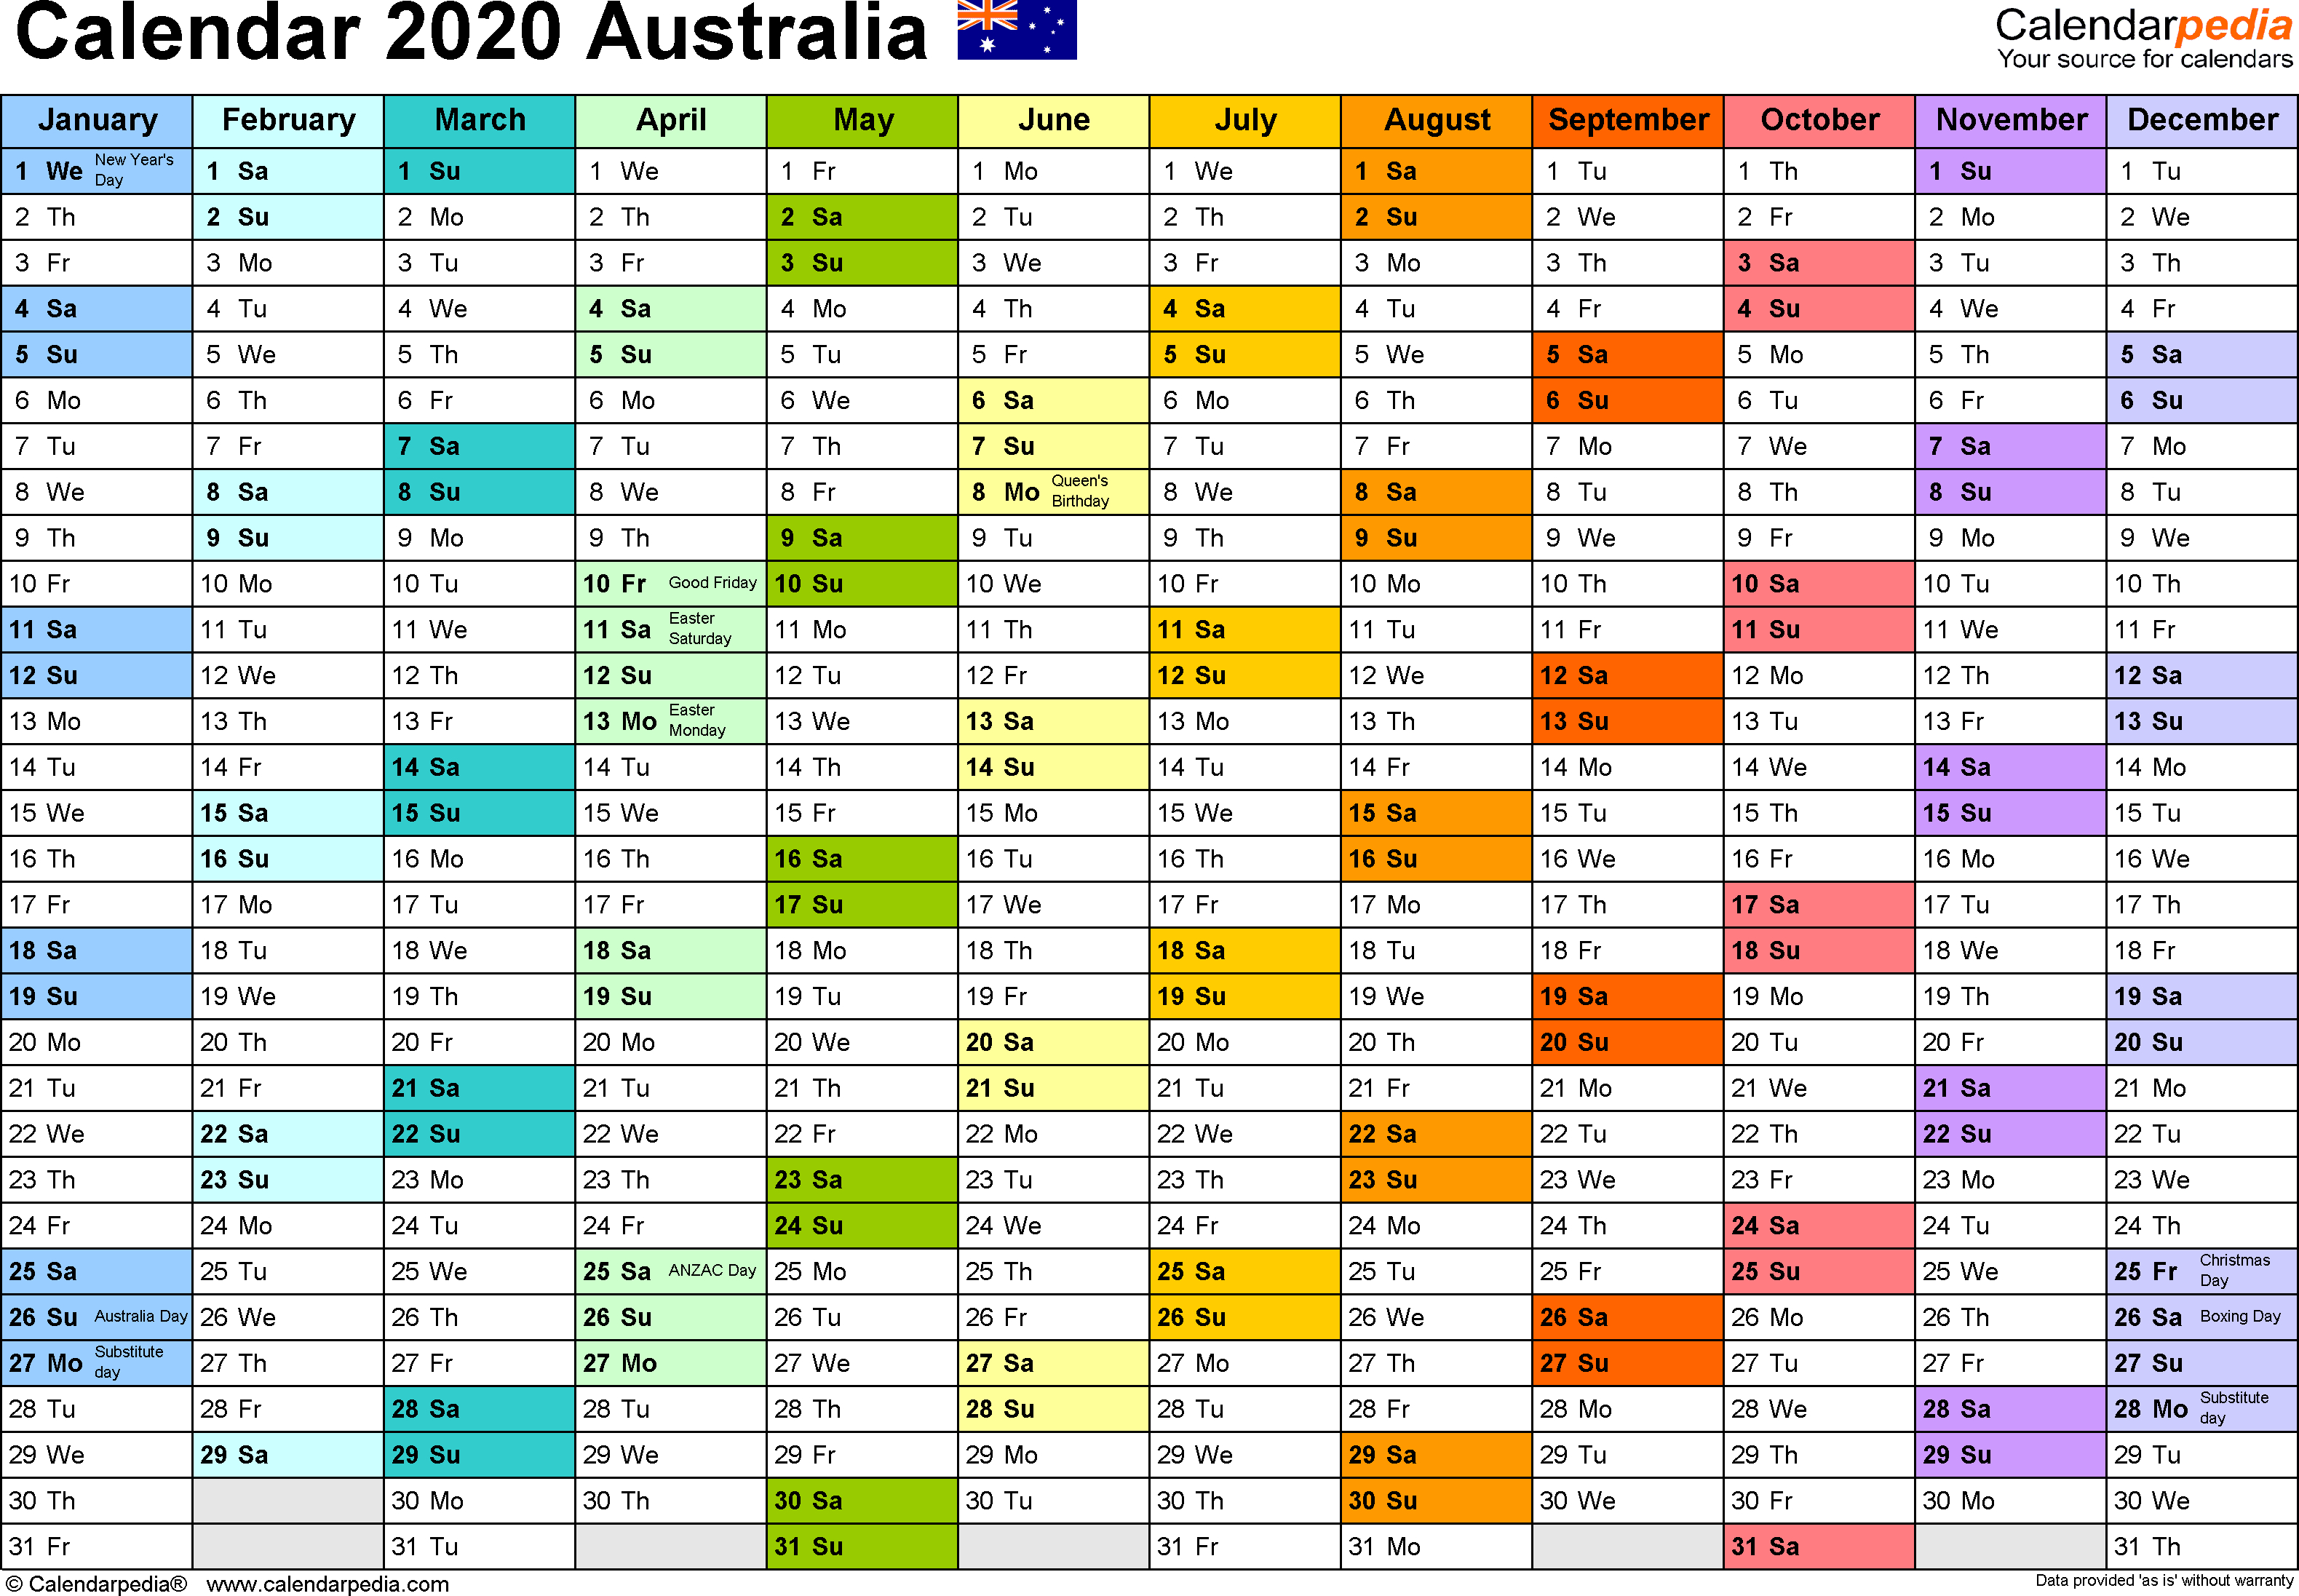 Australia Calendar 2020 - Free Printable Excel Templates regarding Free Shift 2020 Shift Calendar